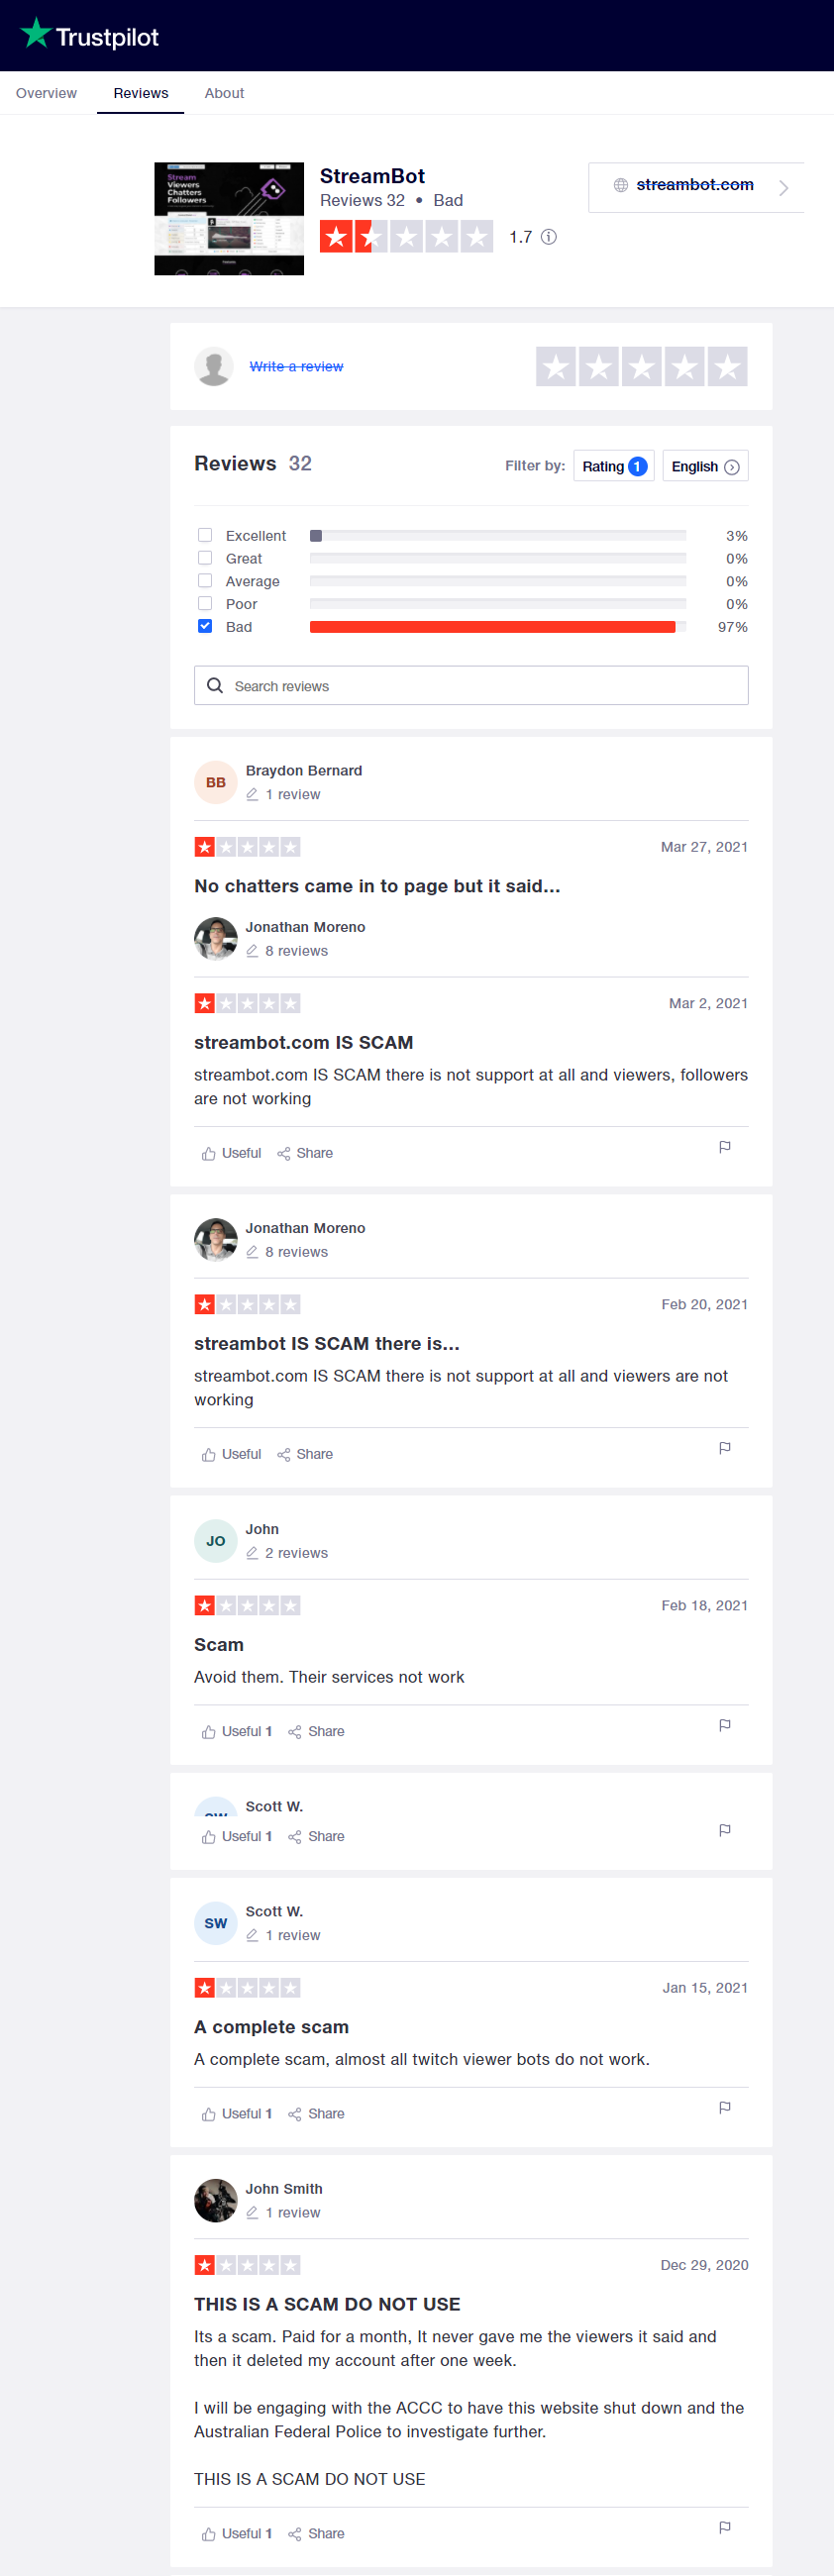 Streambot Trustpilot reviews